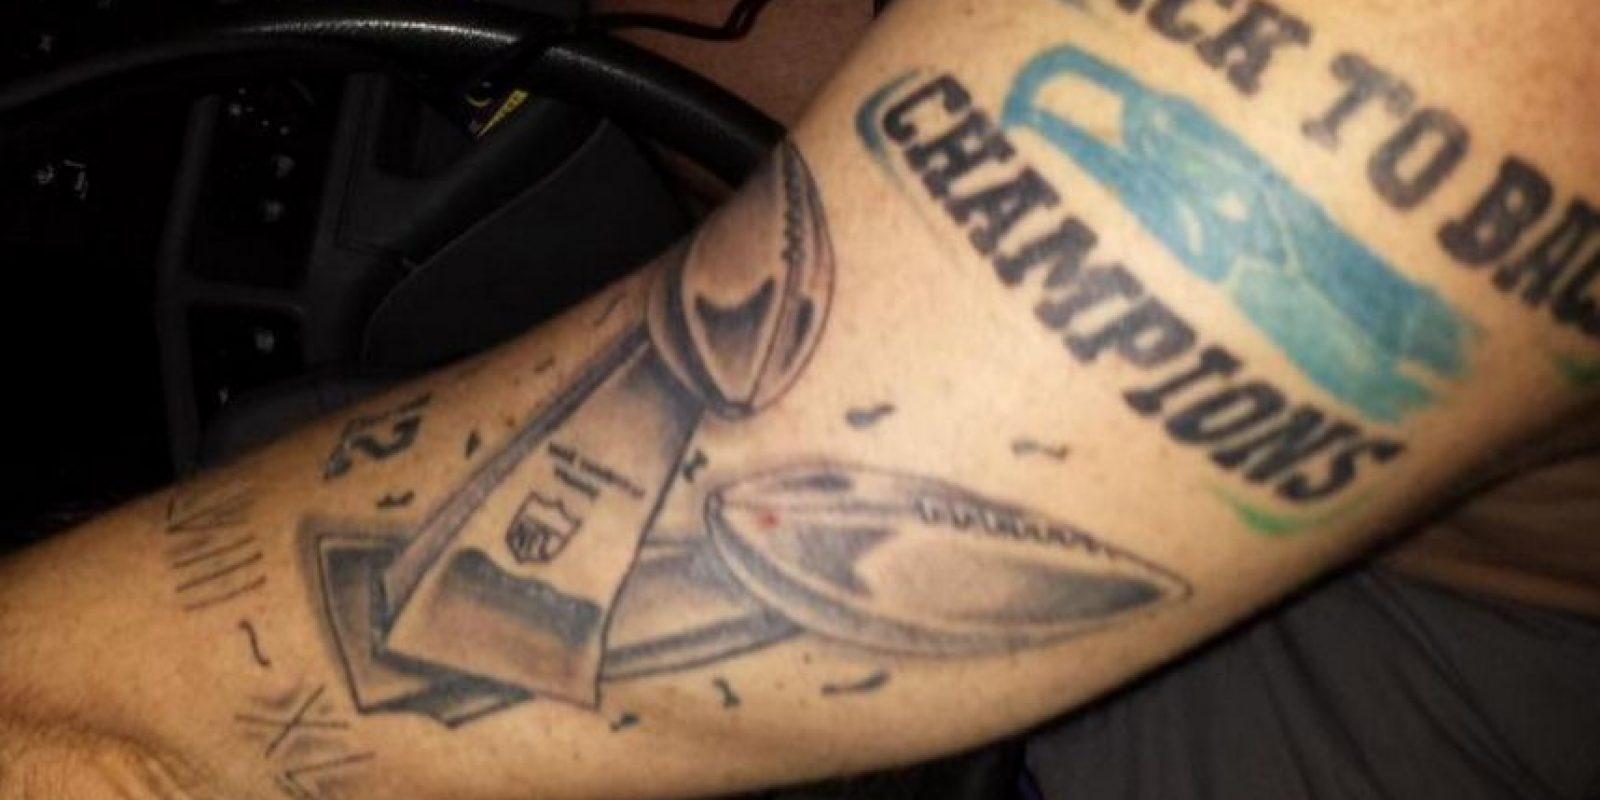 El tatuaje se lo realizó antes de que iniciara el partido. Foto:Twitter